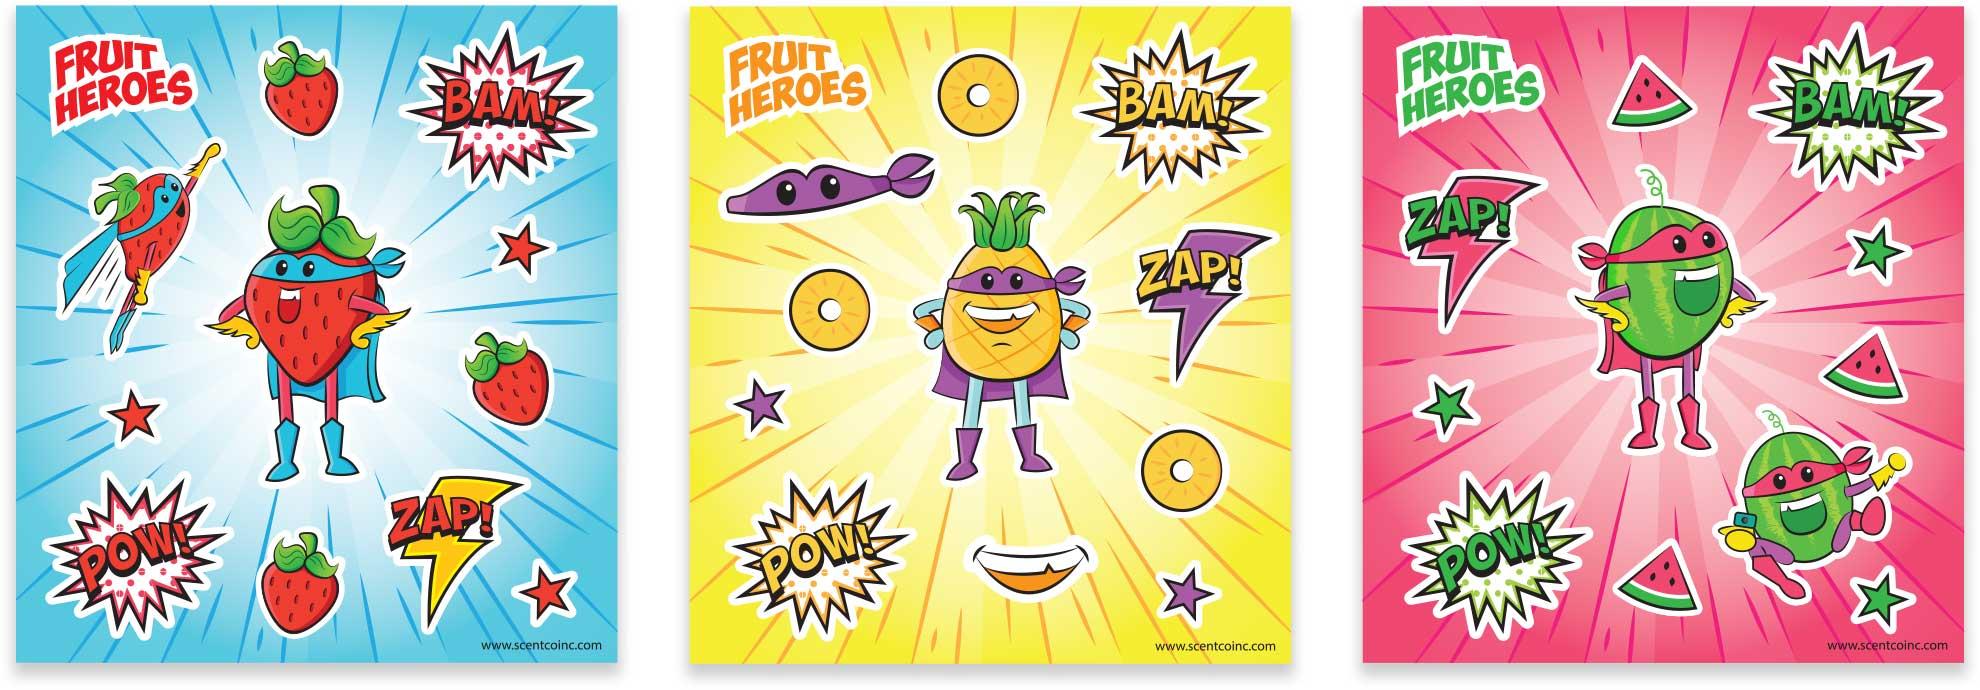 MagInk Fruit Heroes Stickers